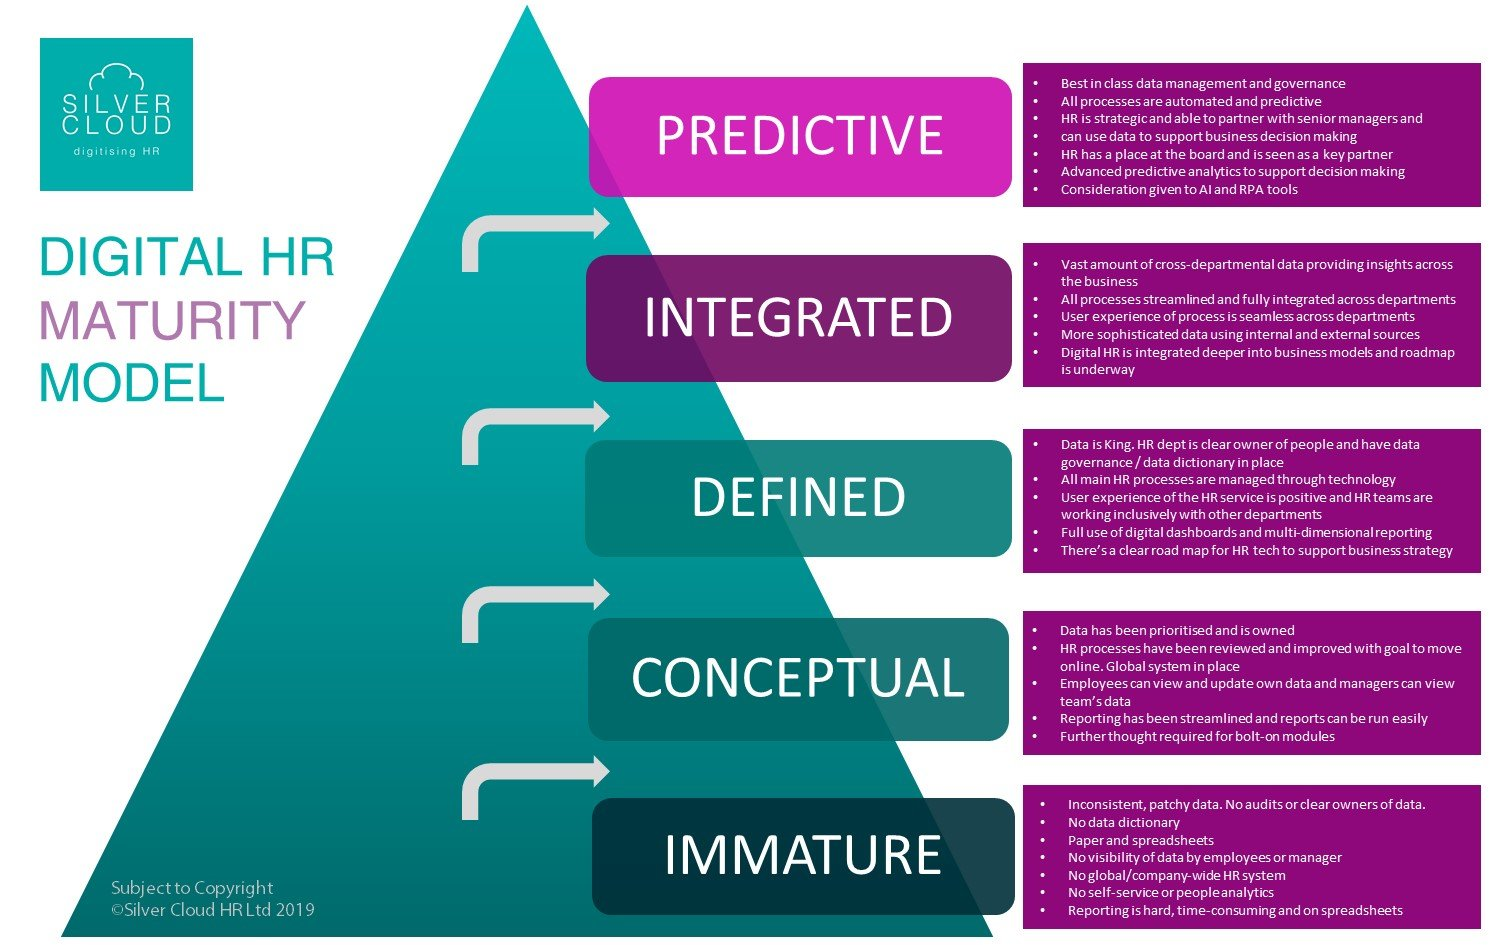 Digital HR Maturity Model